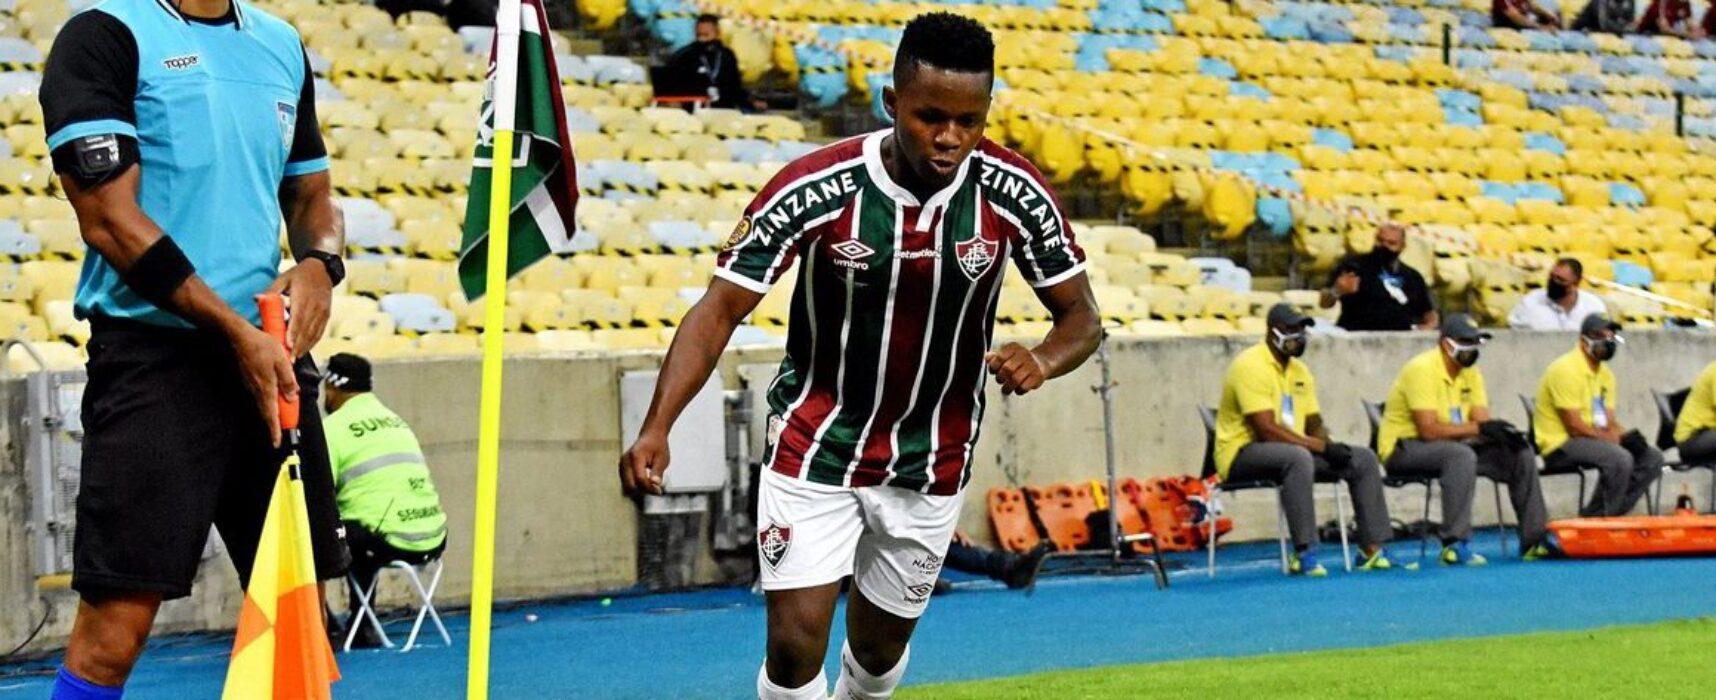 Fluminense pode ter mudanças contra Junior Barranquilla nesta terça